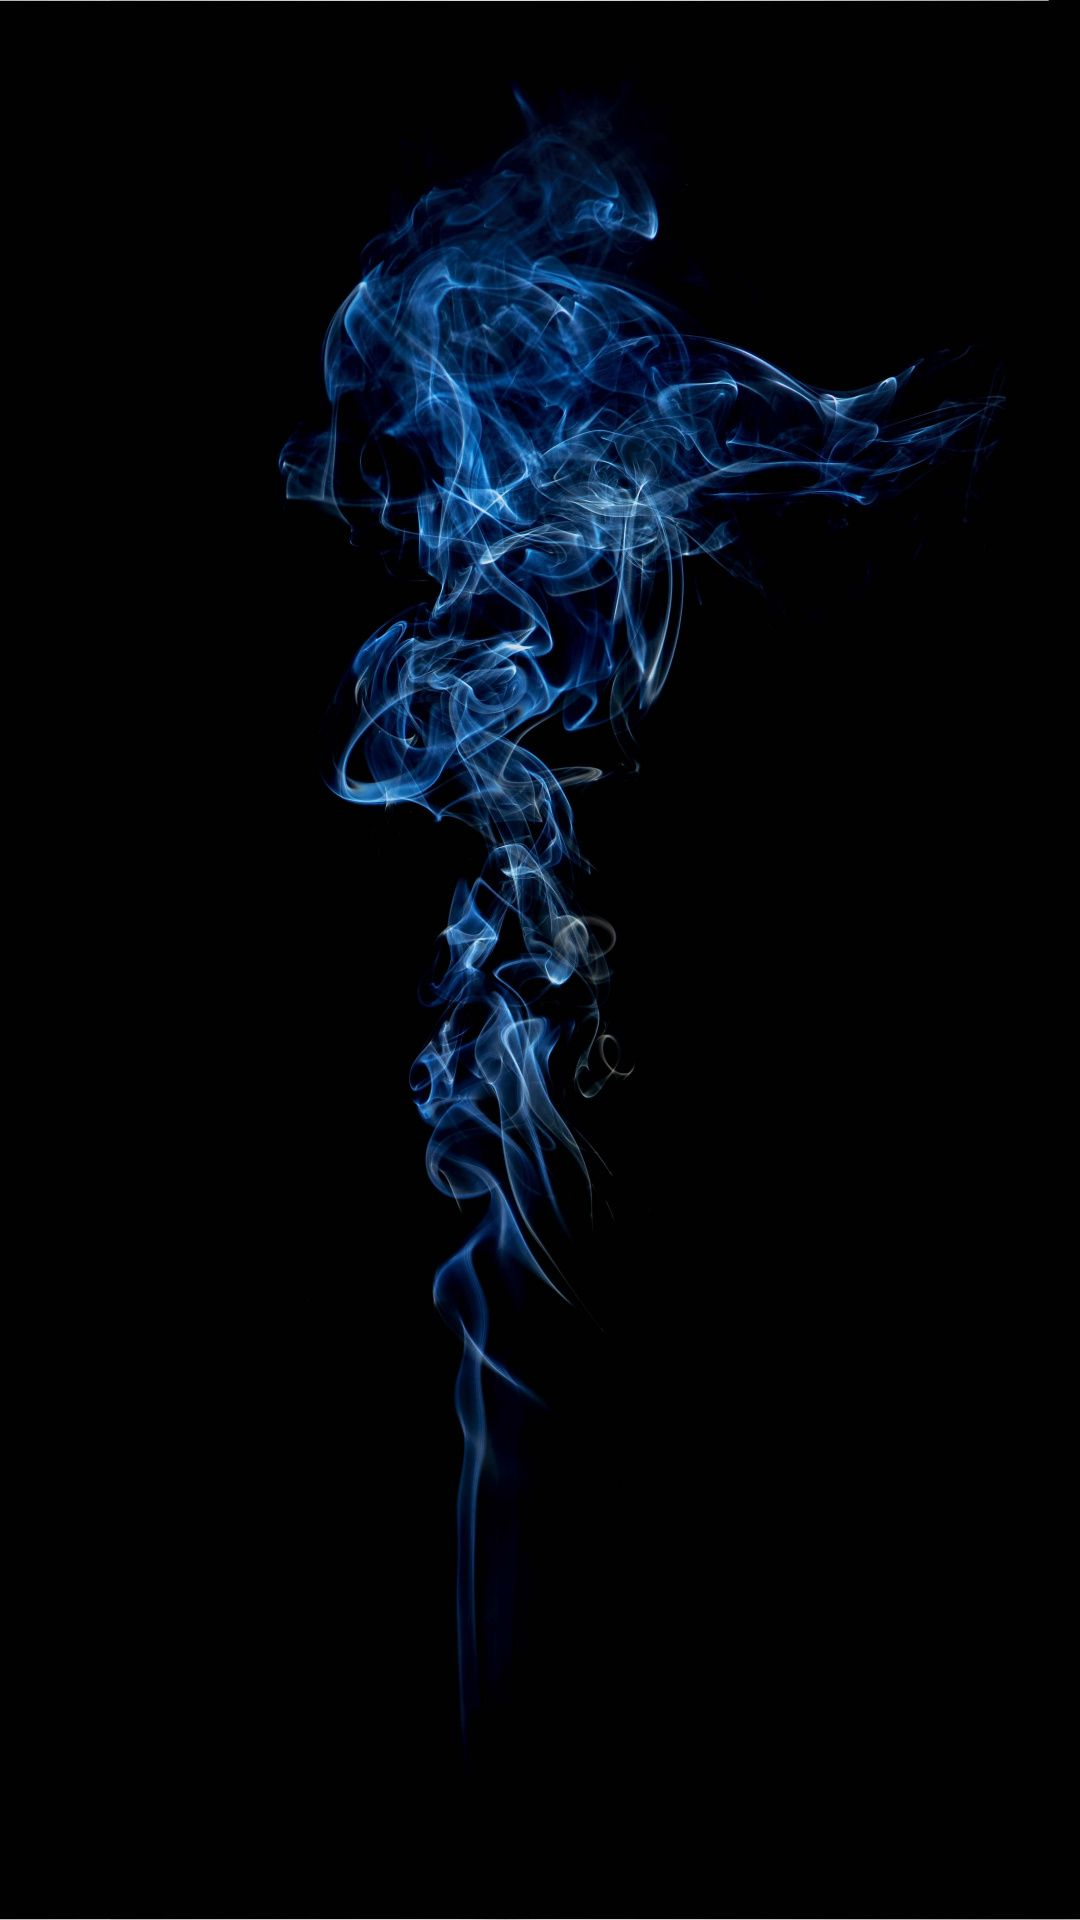 Minimal Blue Smoke Wallpaper Smoke Wallpaper Original Iphone Wallpaper Dark Wallpaper